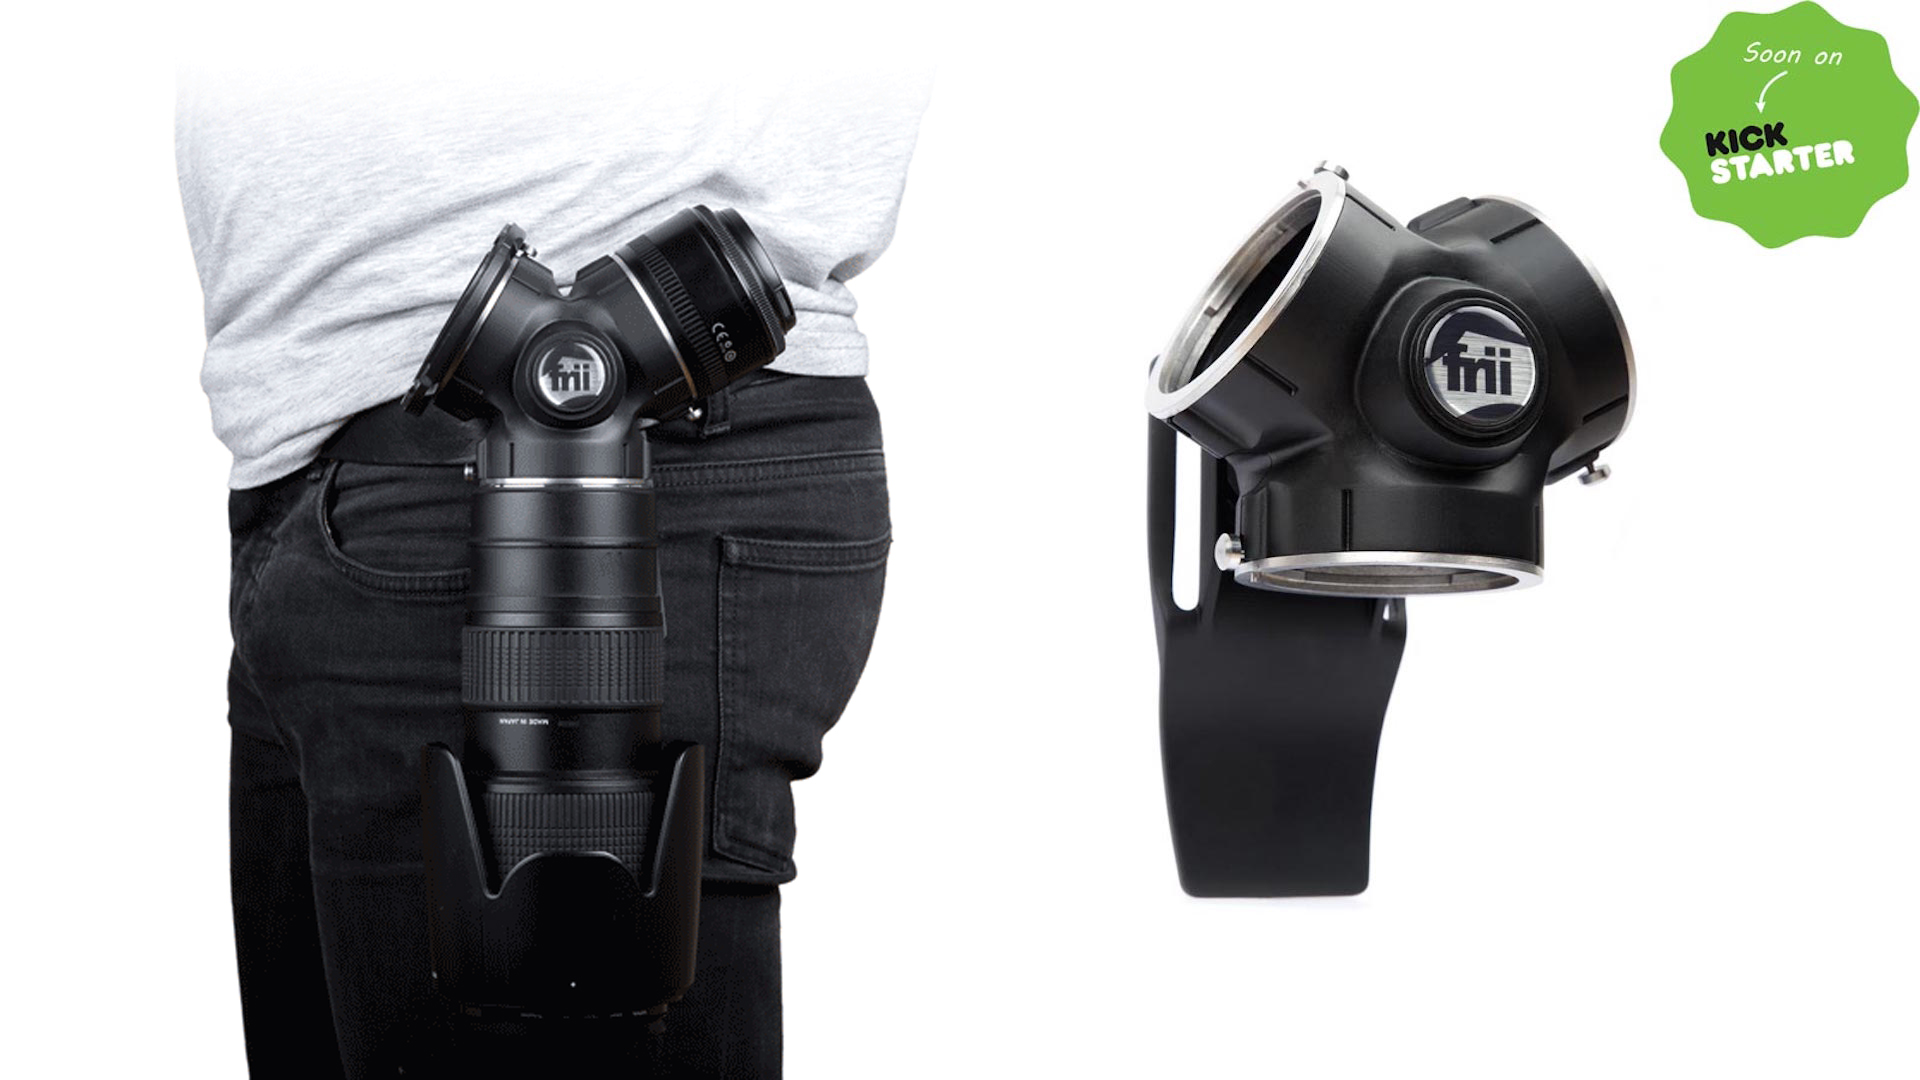 Frii DesignsのTriLens Holder - レンズ交換が素早くできるホルダー